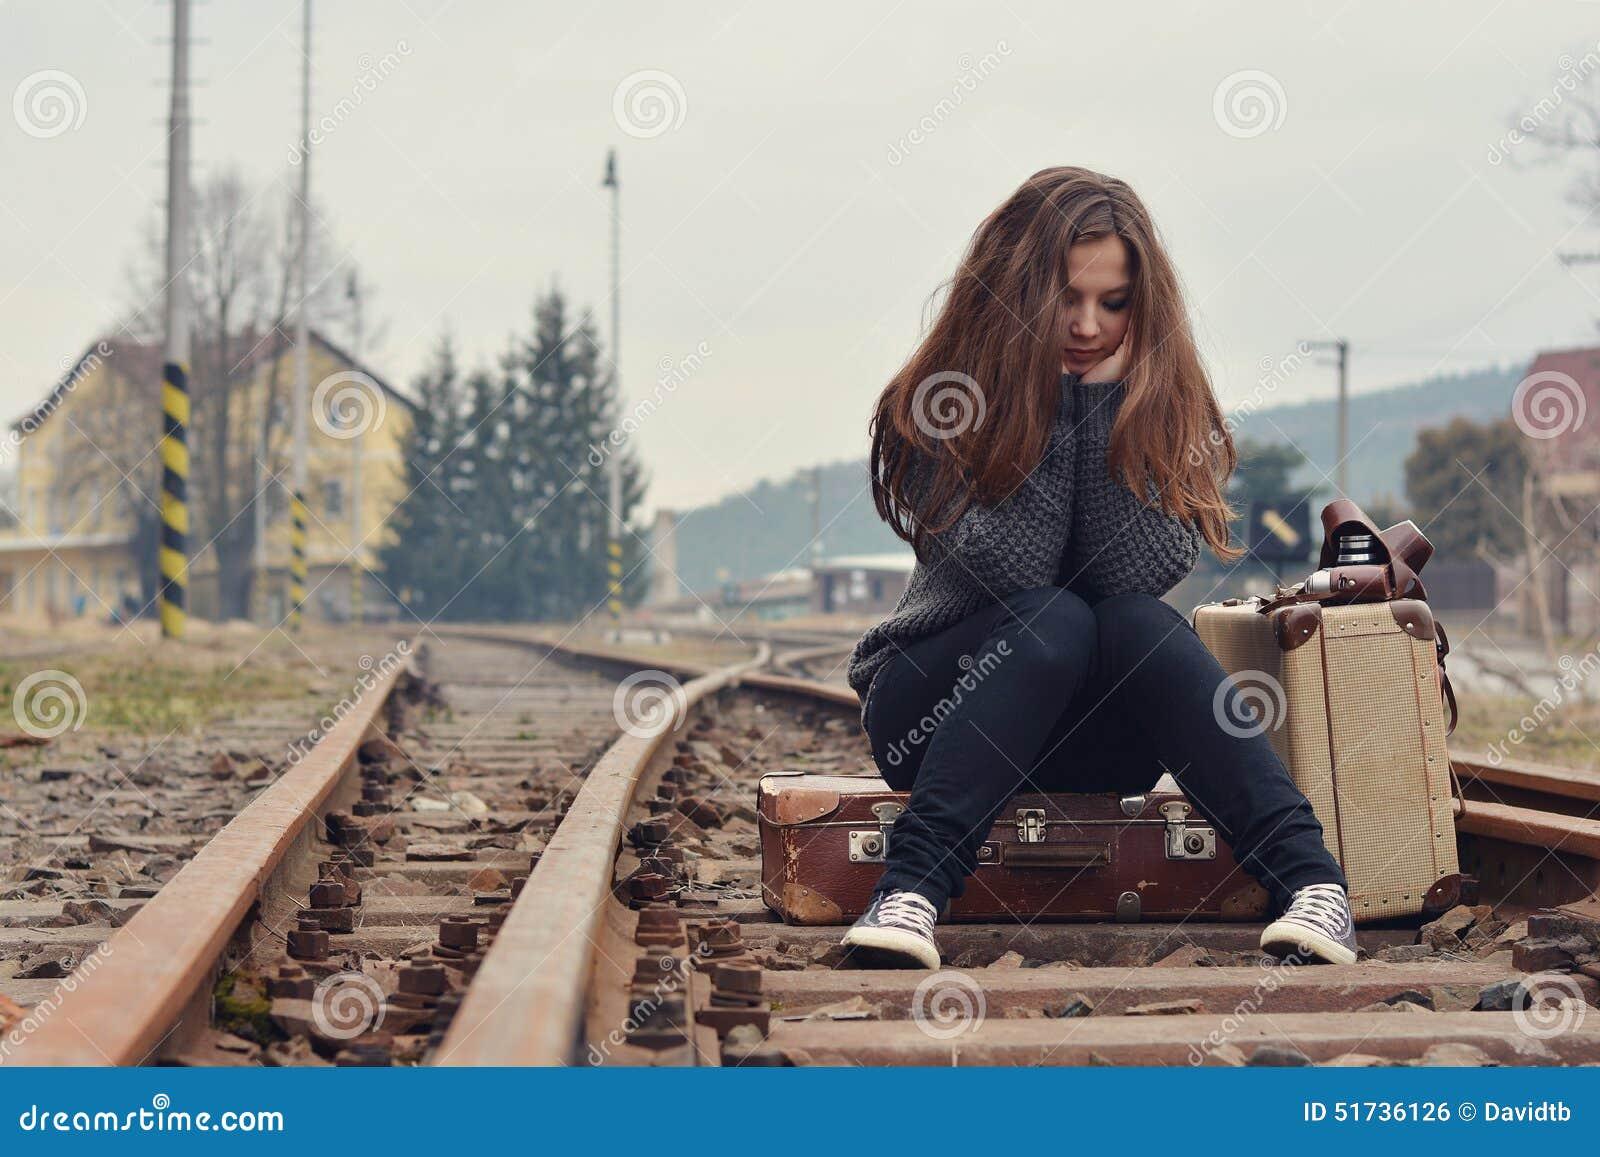 a sad girl on railway tracks Stock Photo: 57062504 - Alamy